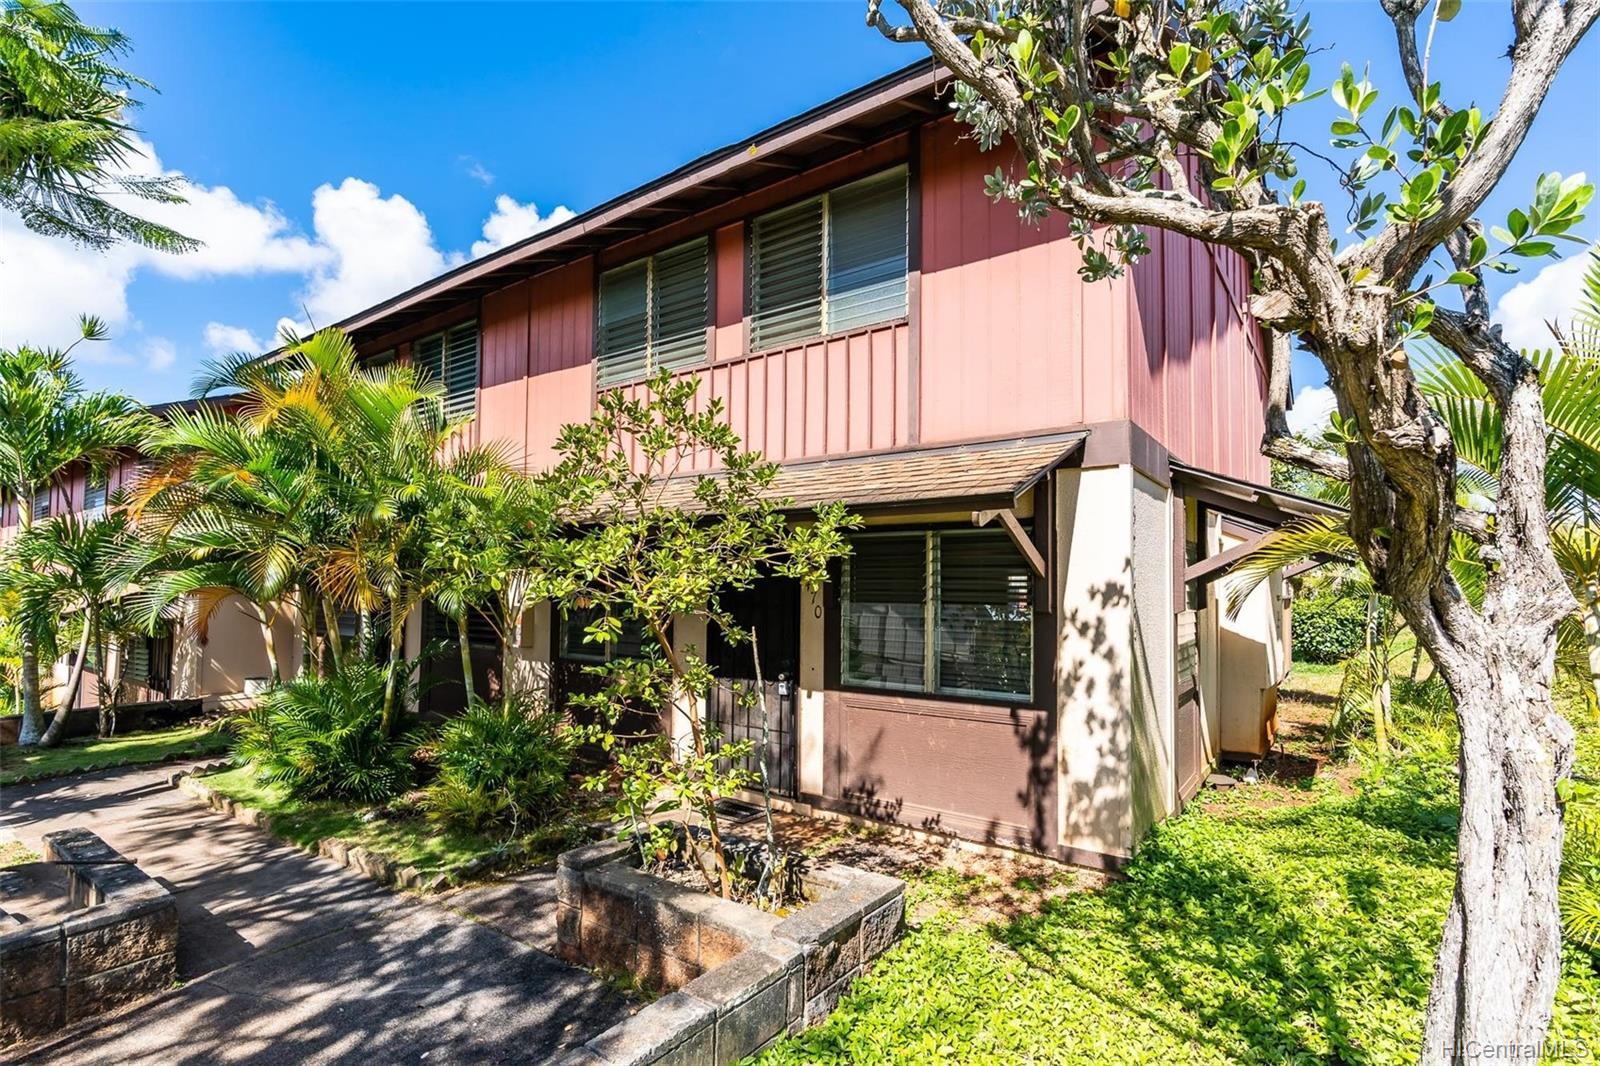 8086237300 townhouse # 470, Mililani, Hawaii - photo 24 of 25